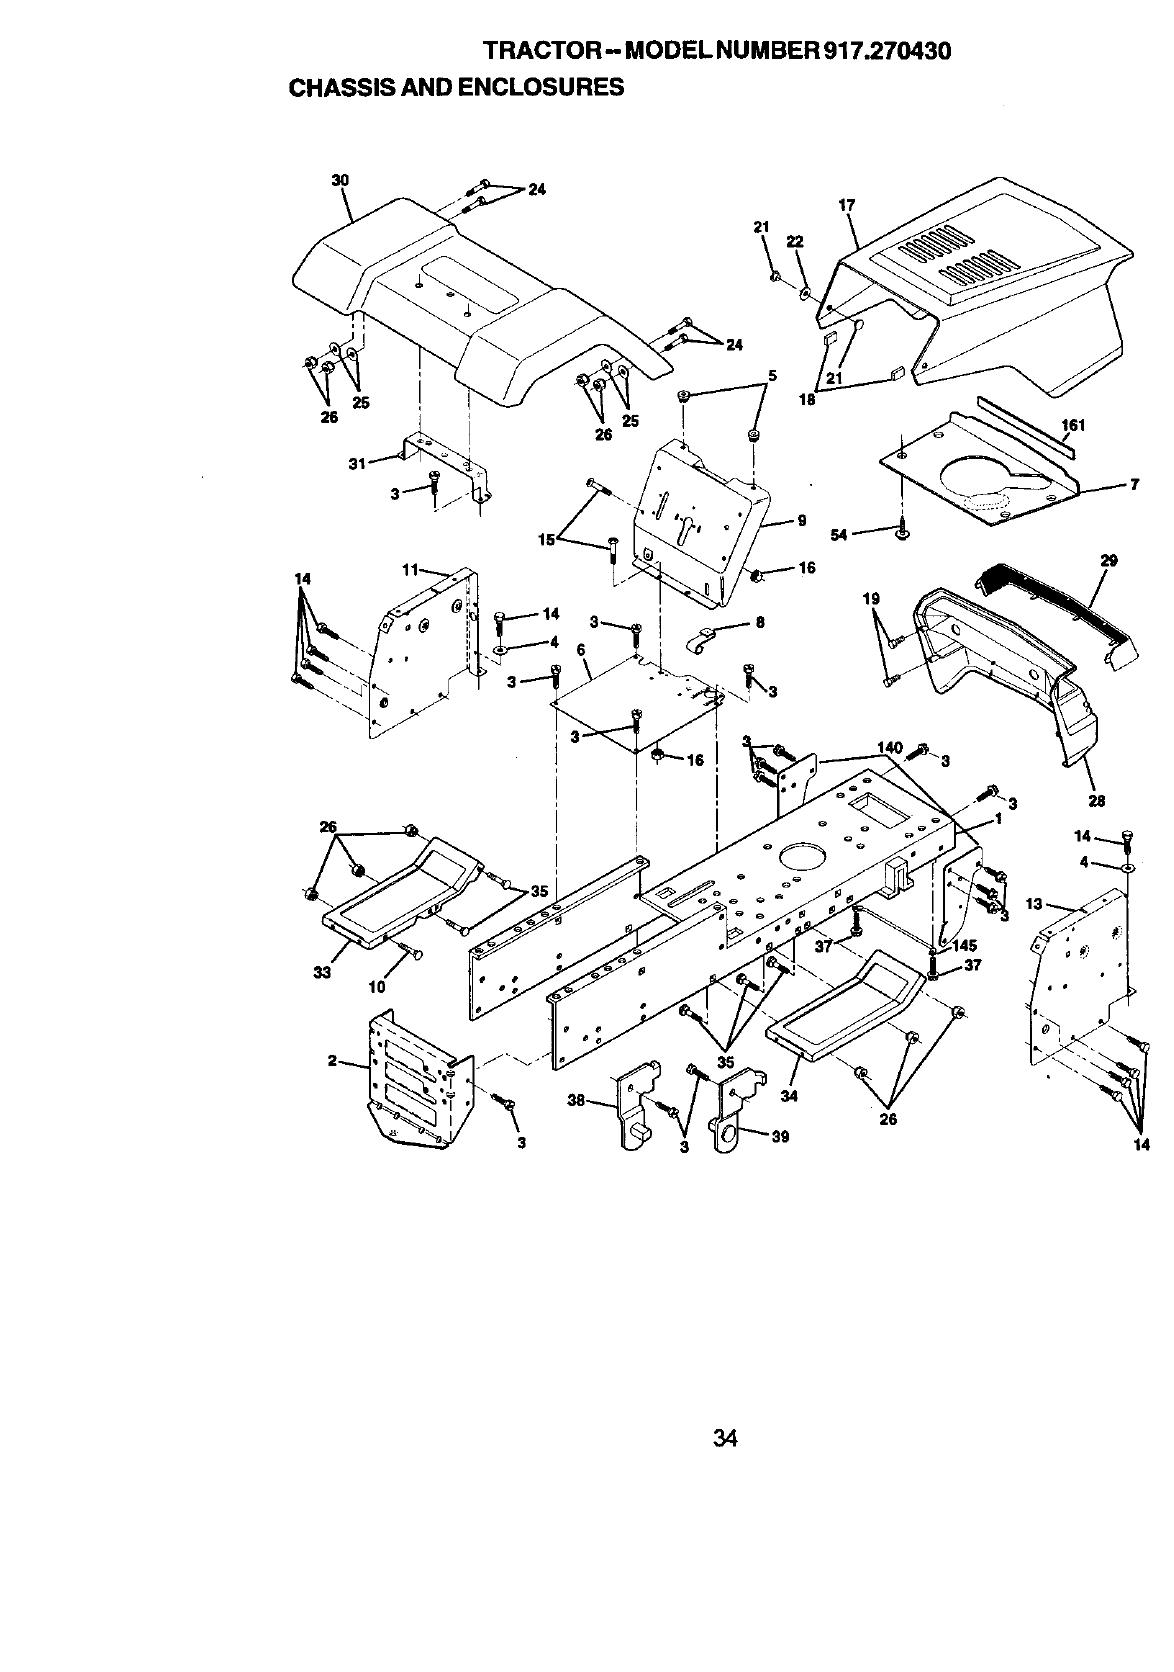 Craftsman 917270430 User Manual 13.5 HP 38 MOWER 5SPD LAWN